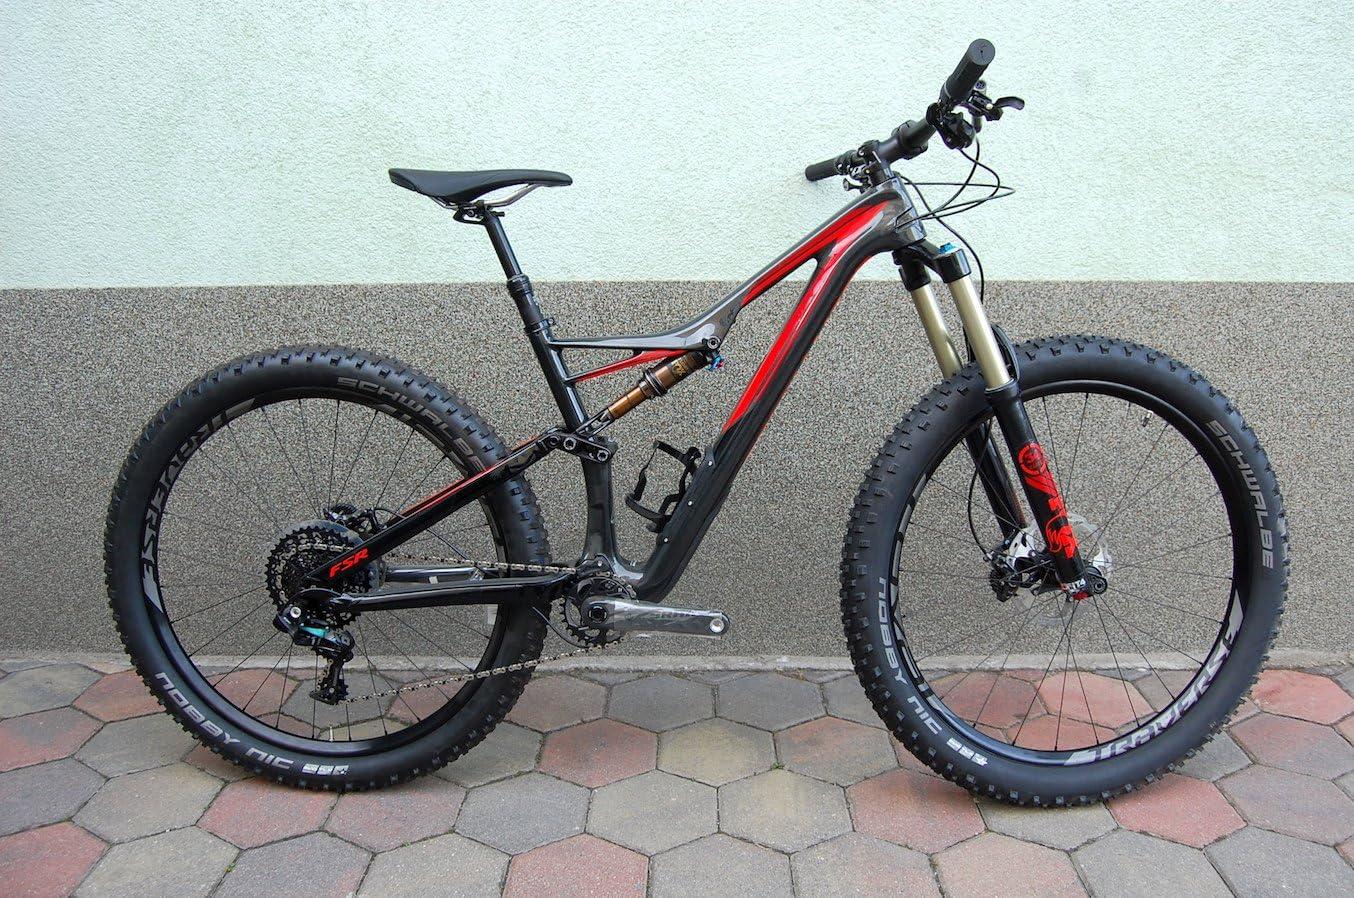 Specialized stumpjumper FSR Expert 6 fattie – Carbon Mountain Bike – 650B + – 2016 – Size M/43 cm: Amazon.es ...